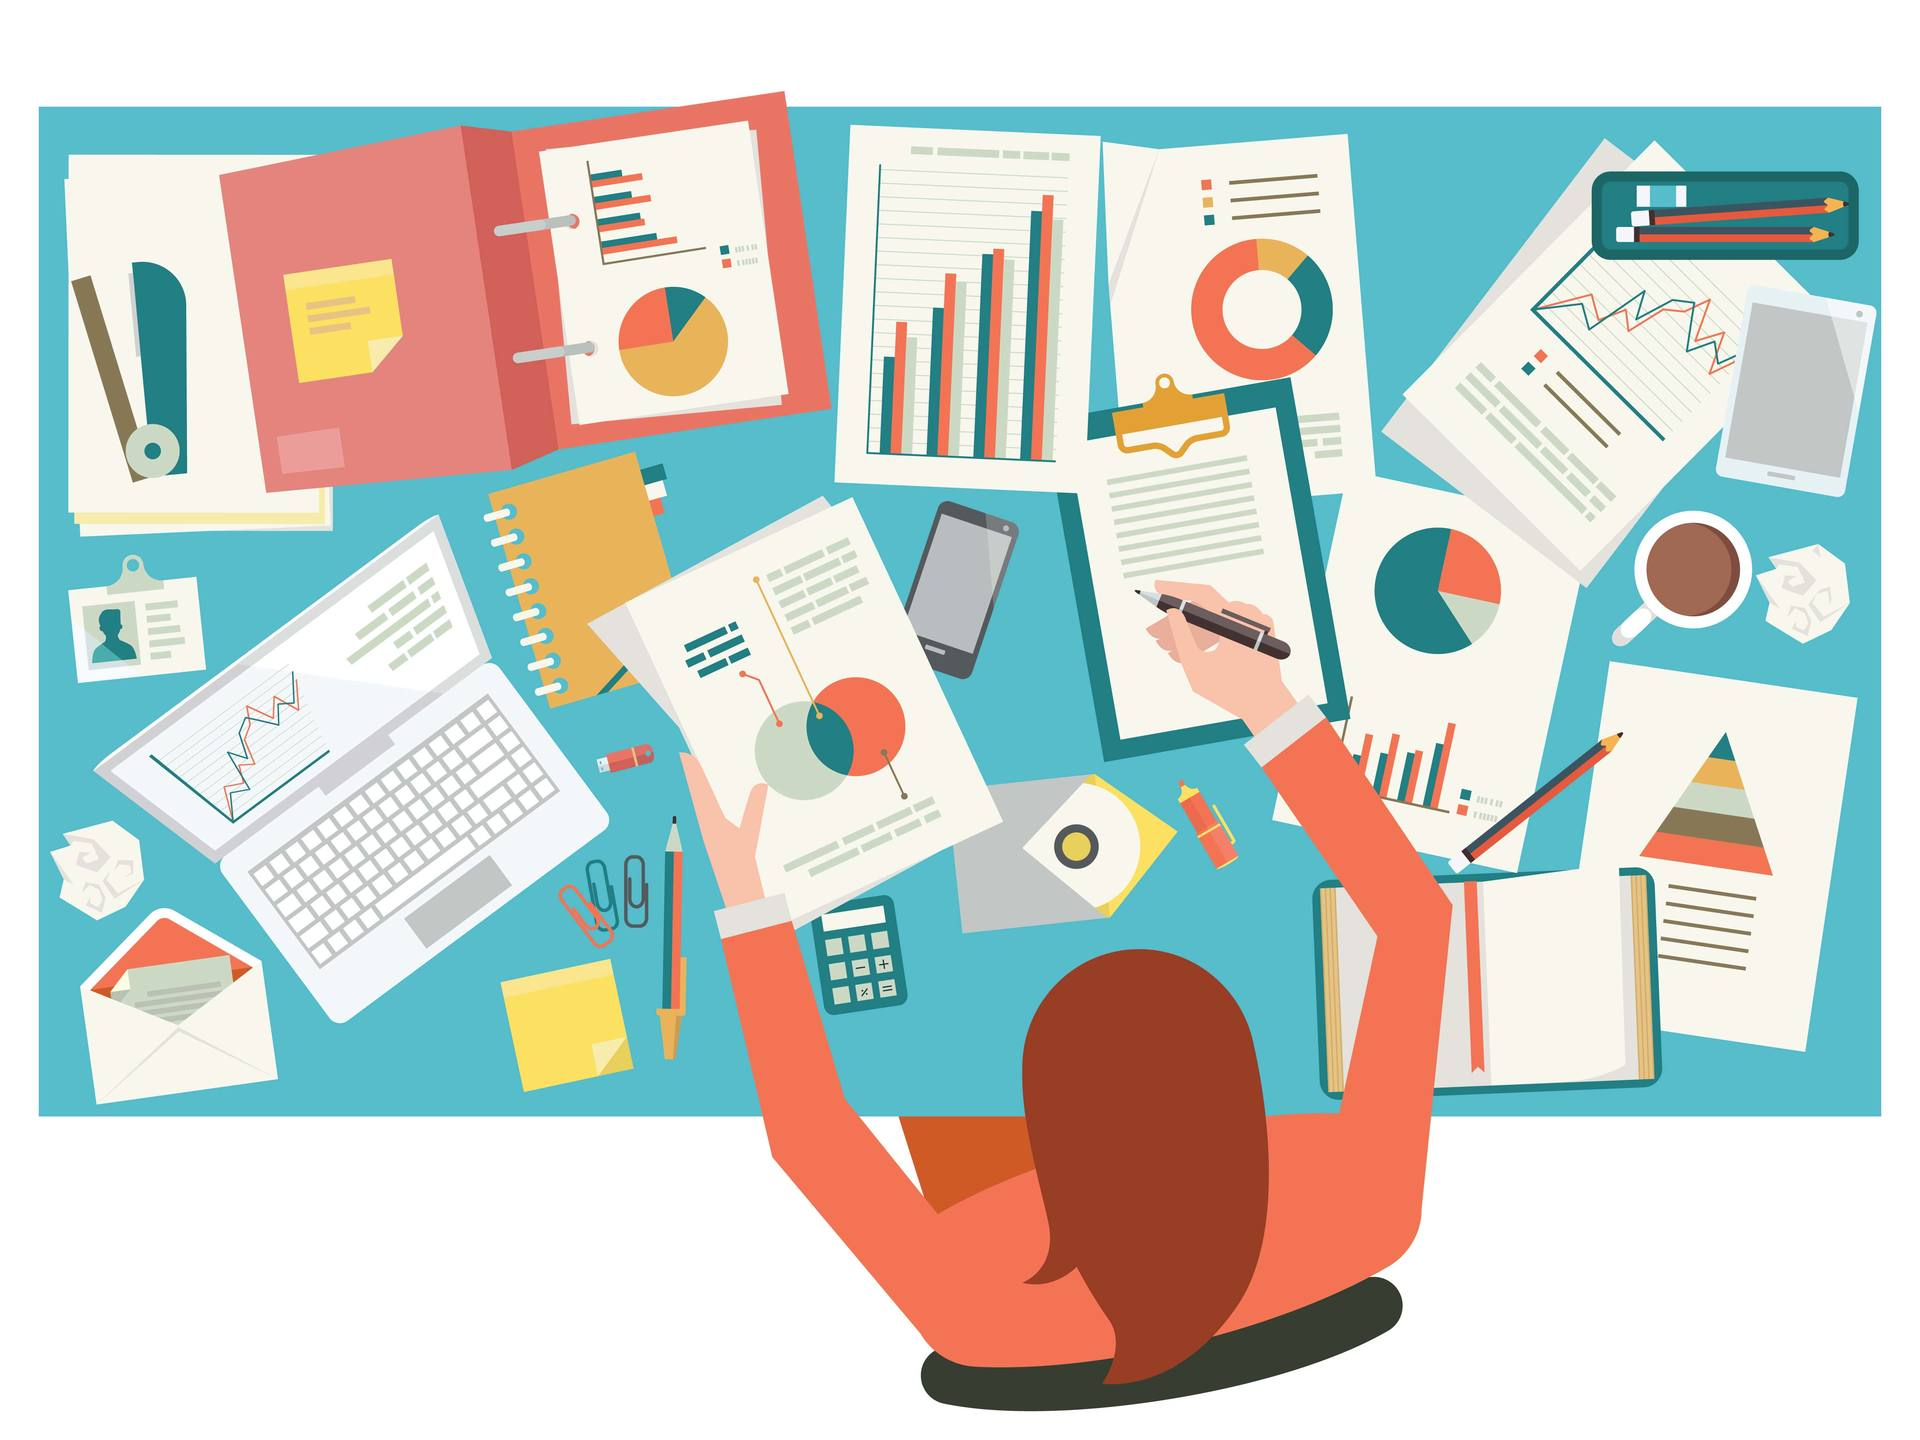 Project dissertation marketing quality academic